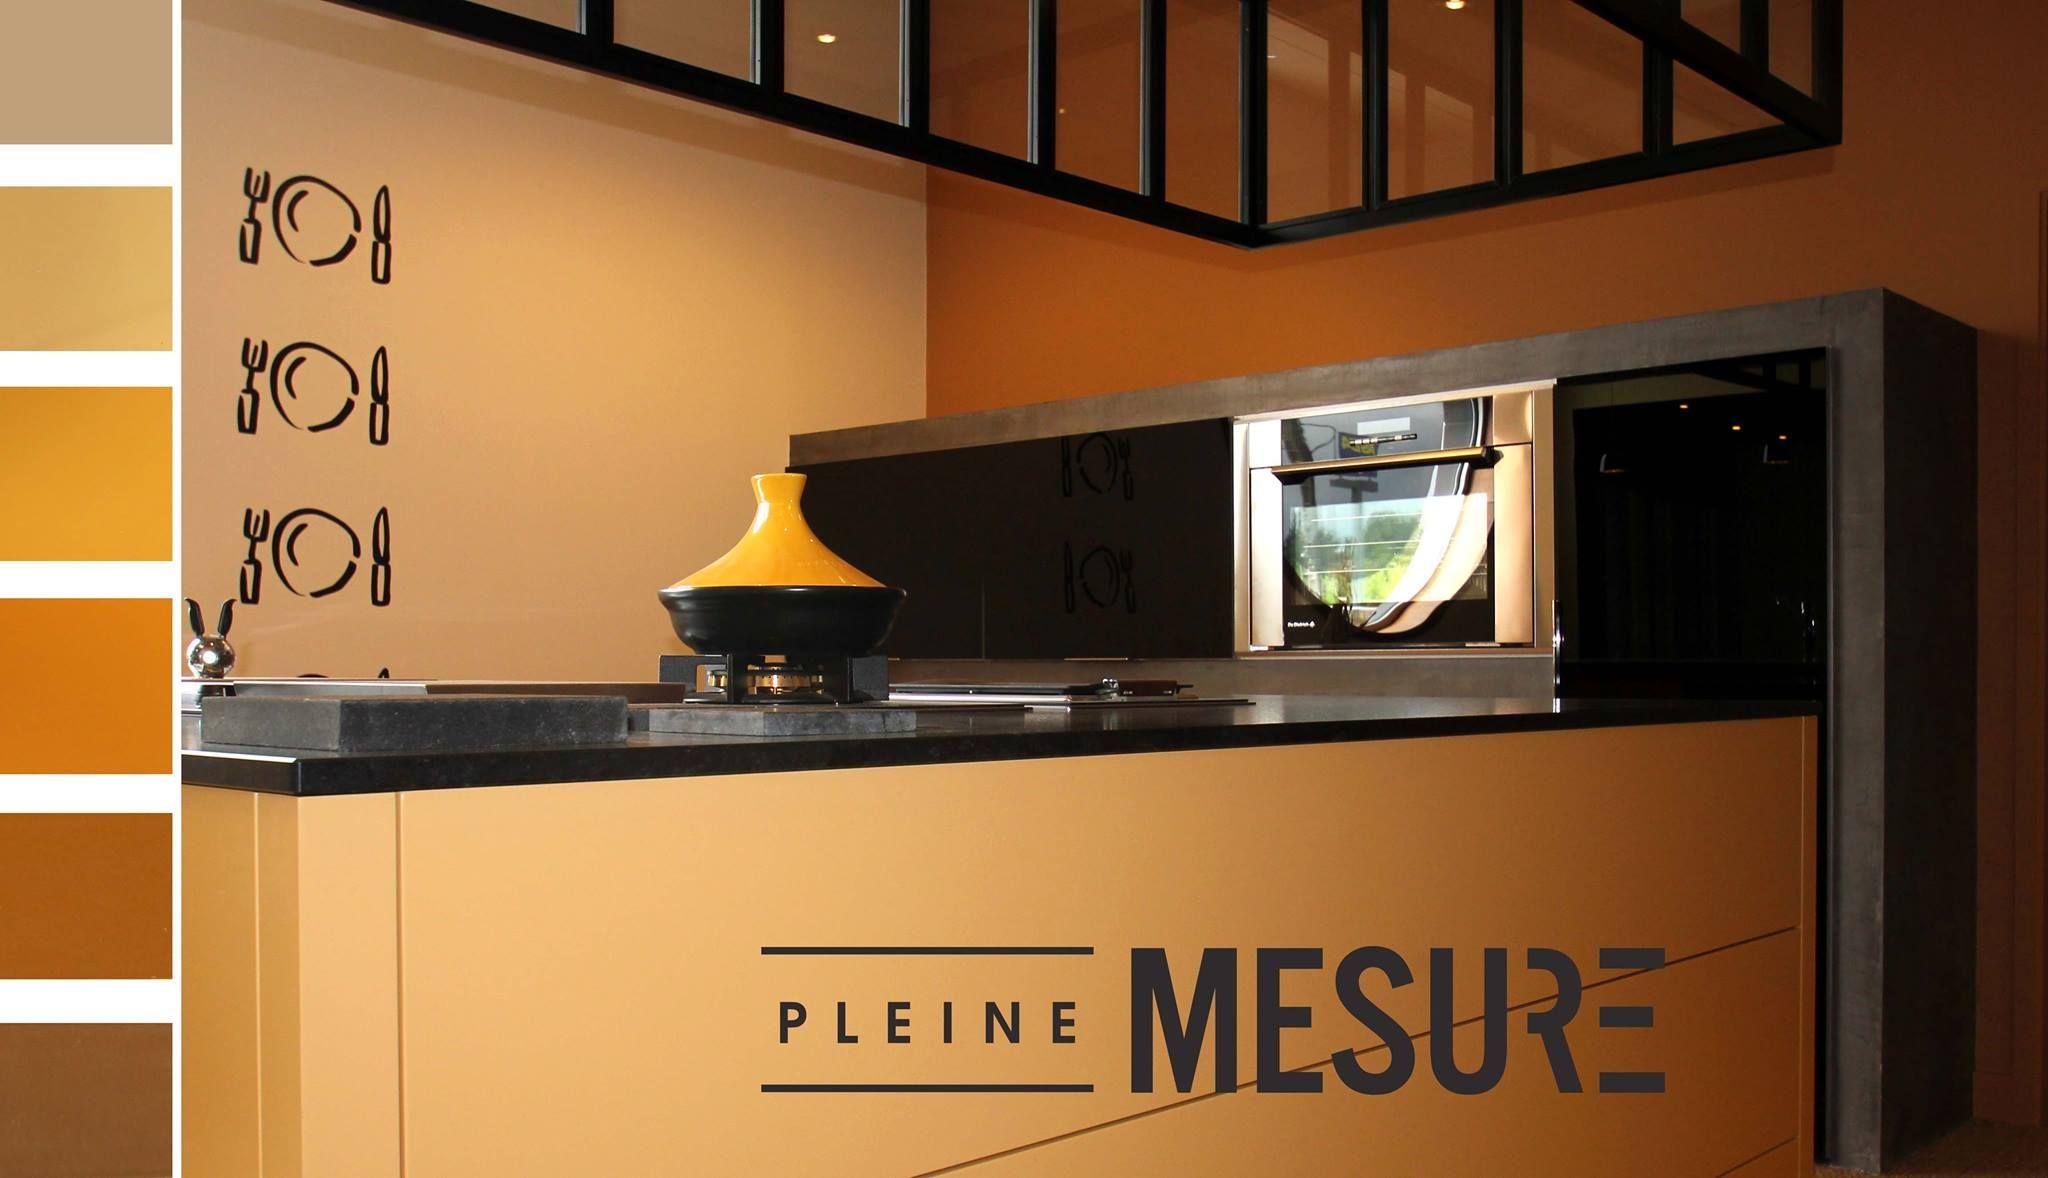 #cuisine #agencement #interieur #pleinemesure #decoration